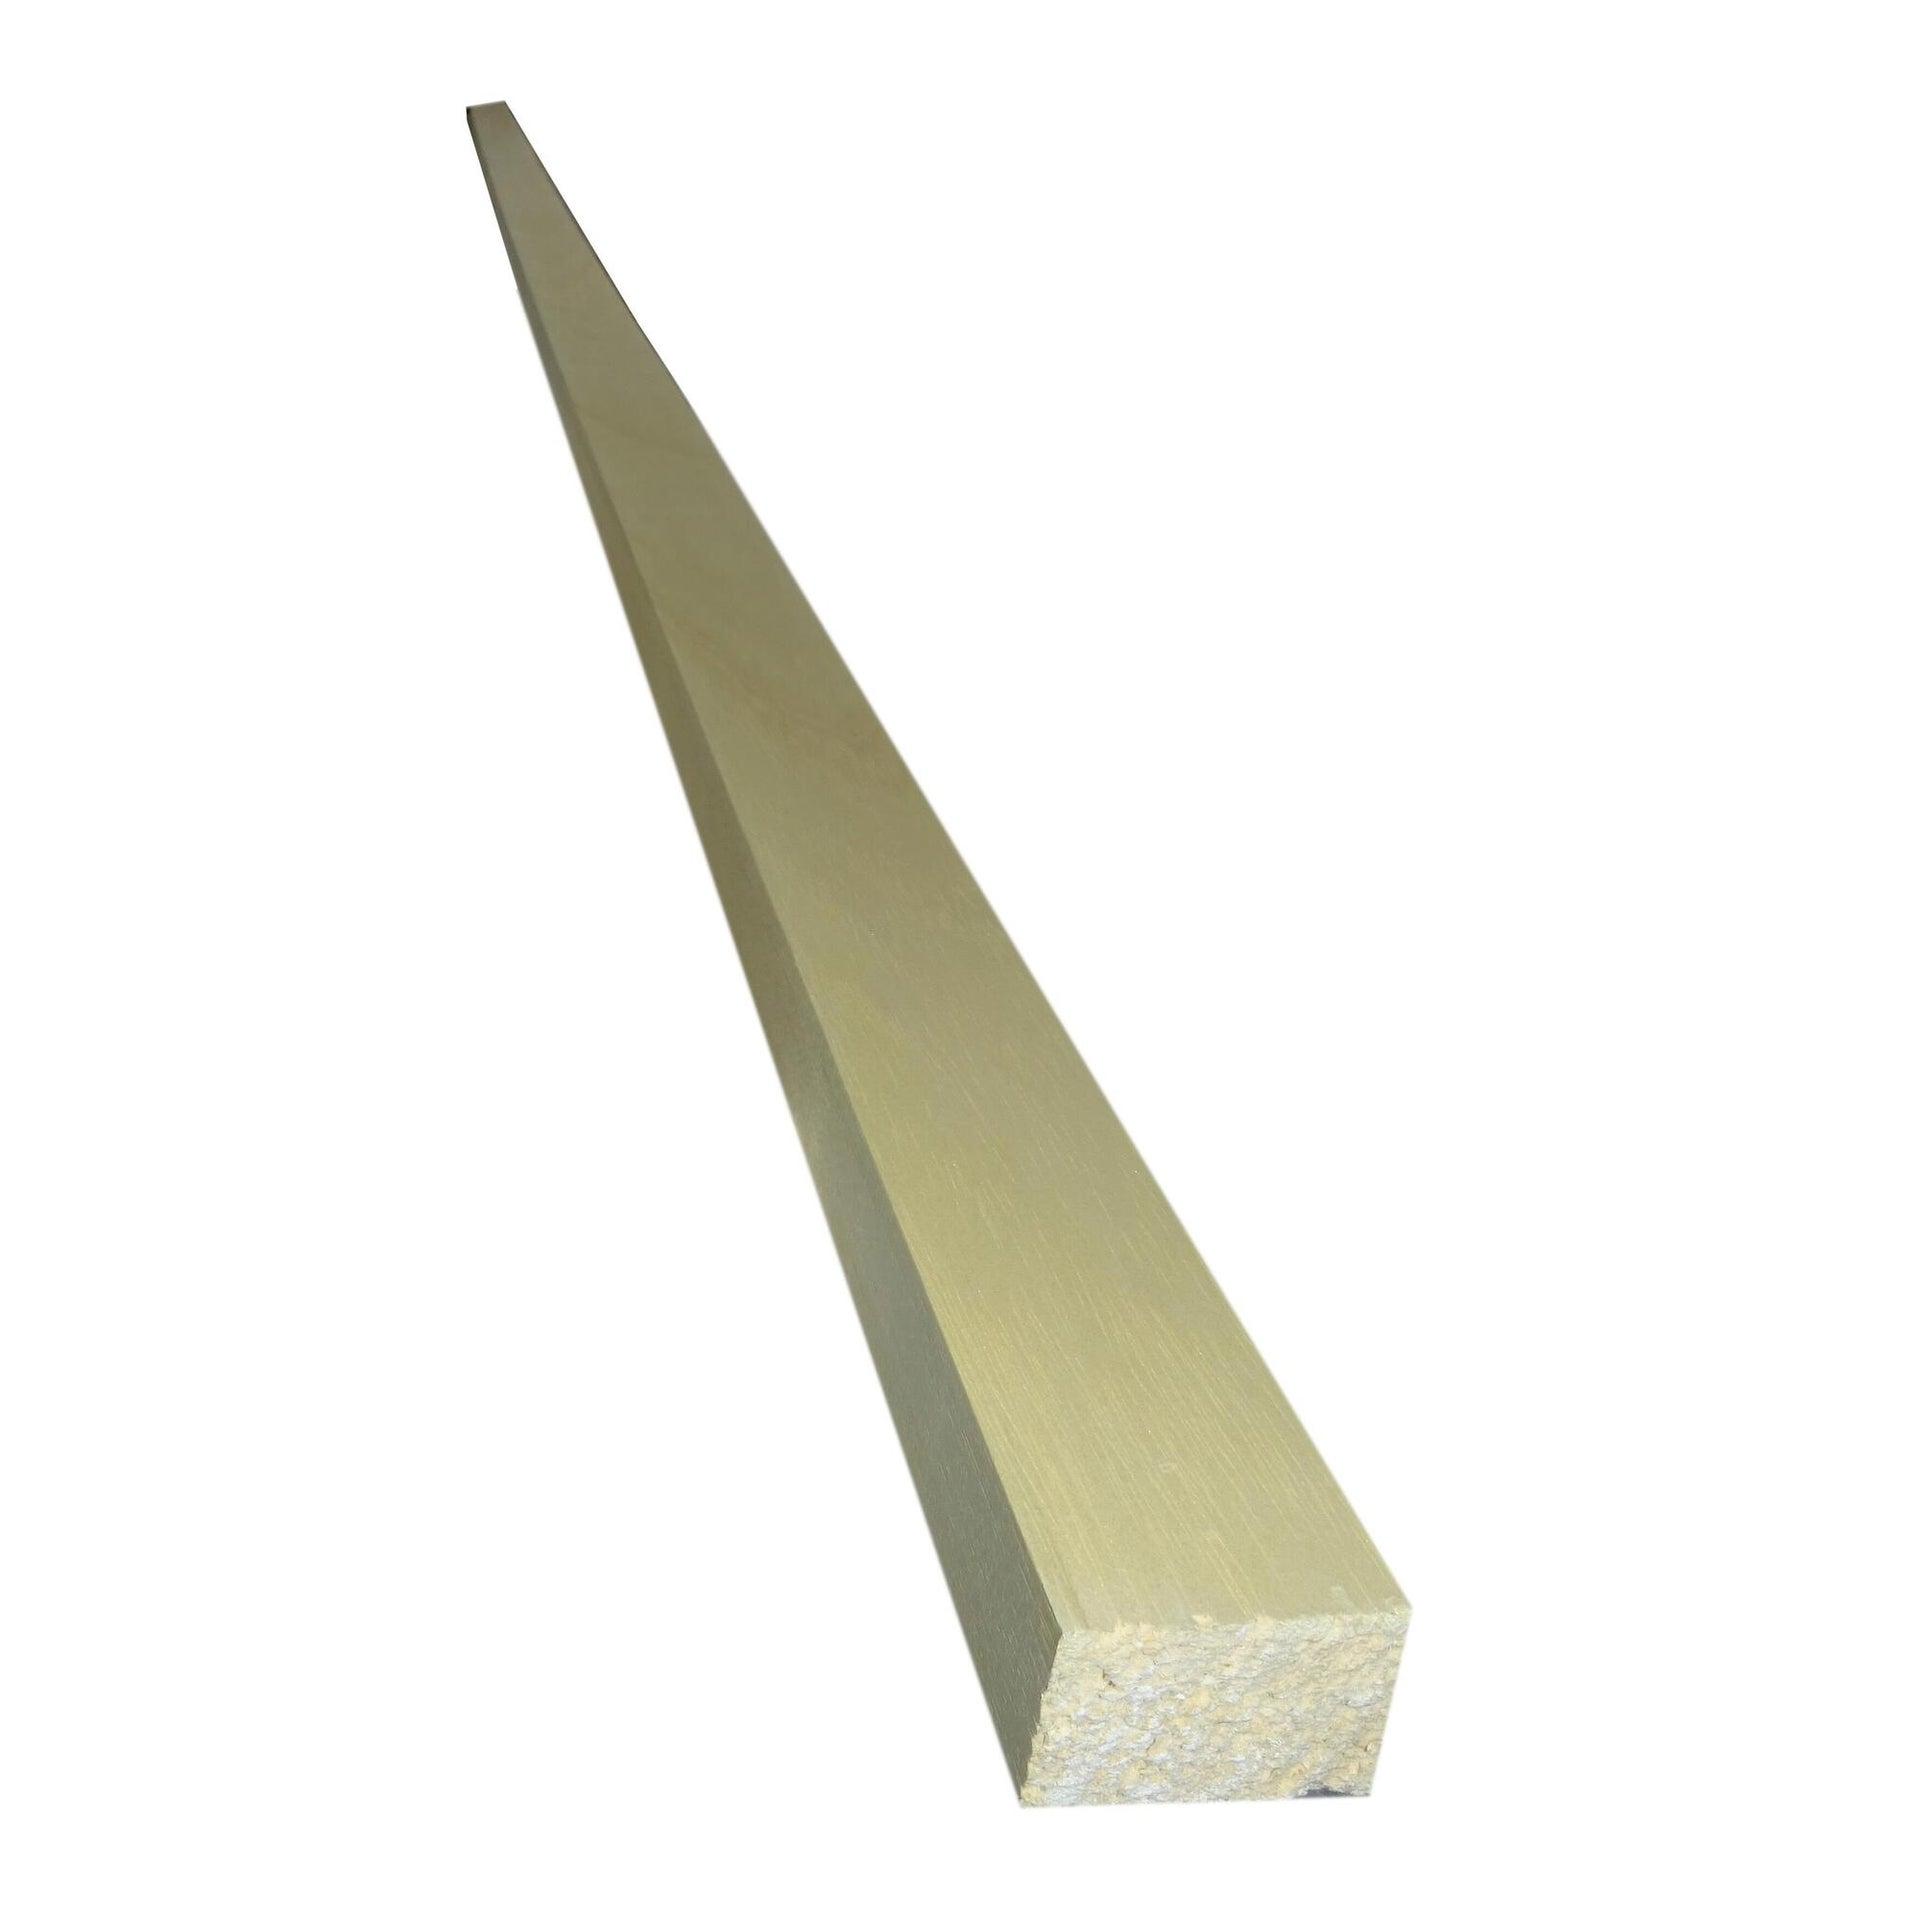 Listello piallato ayous 2.4 m x 50 mm, Sp 30 mm